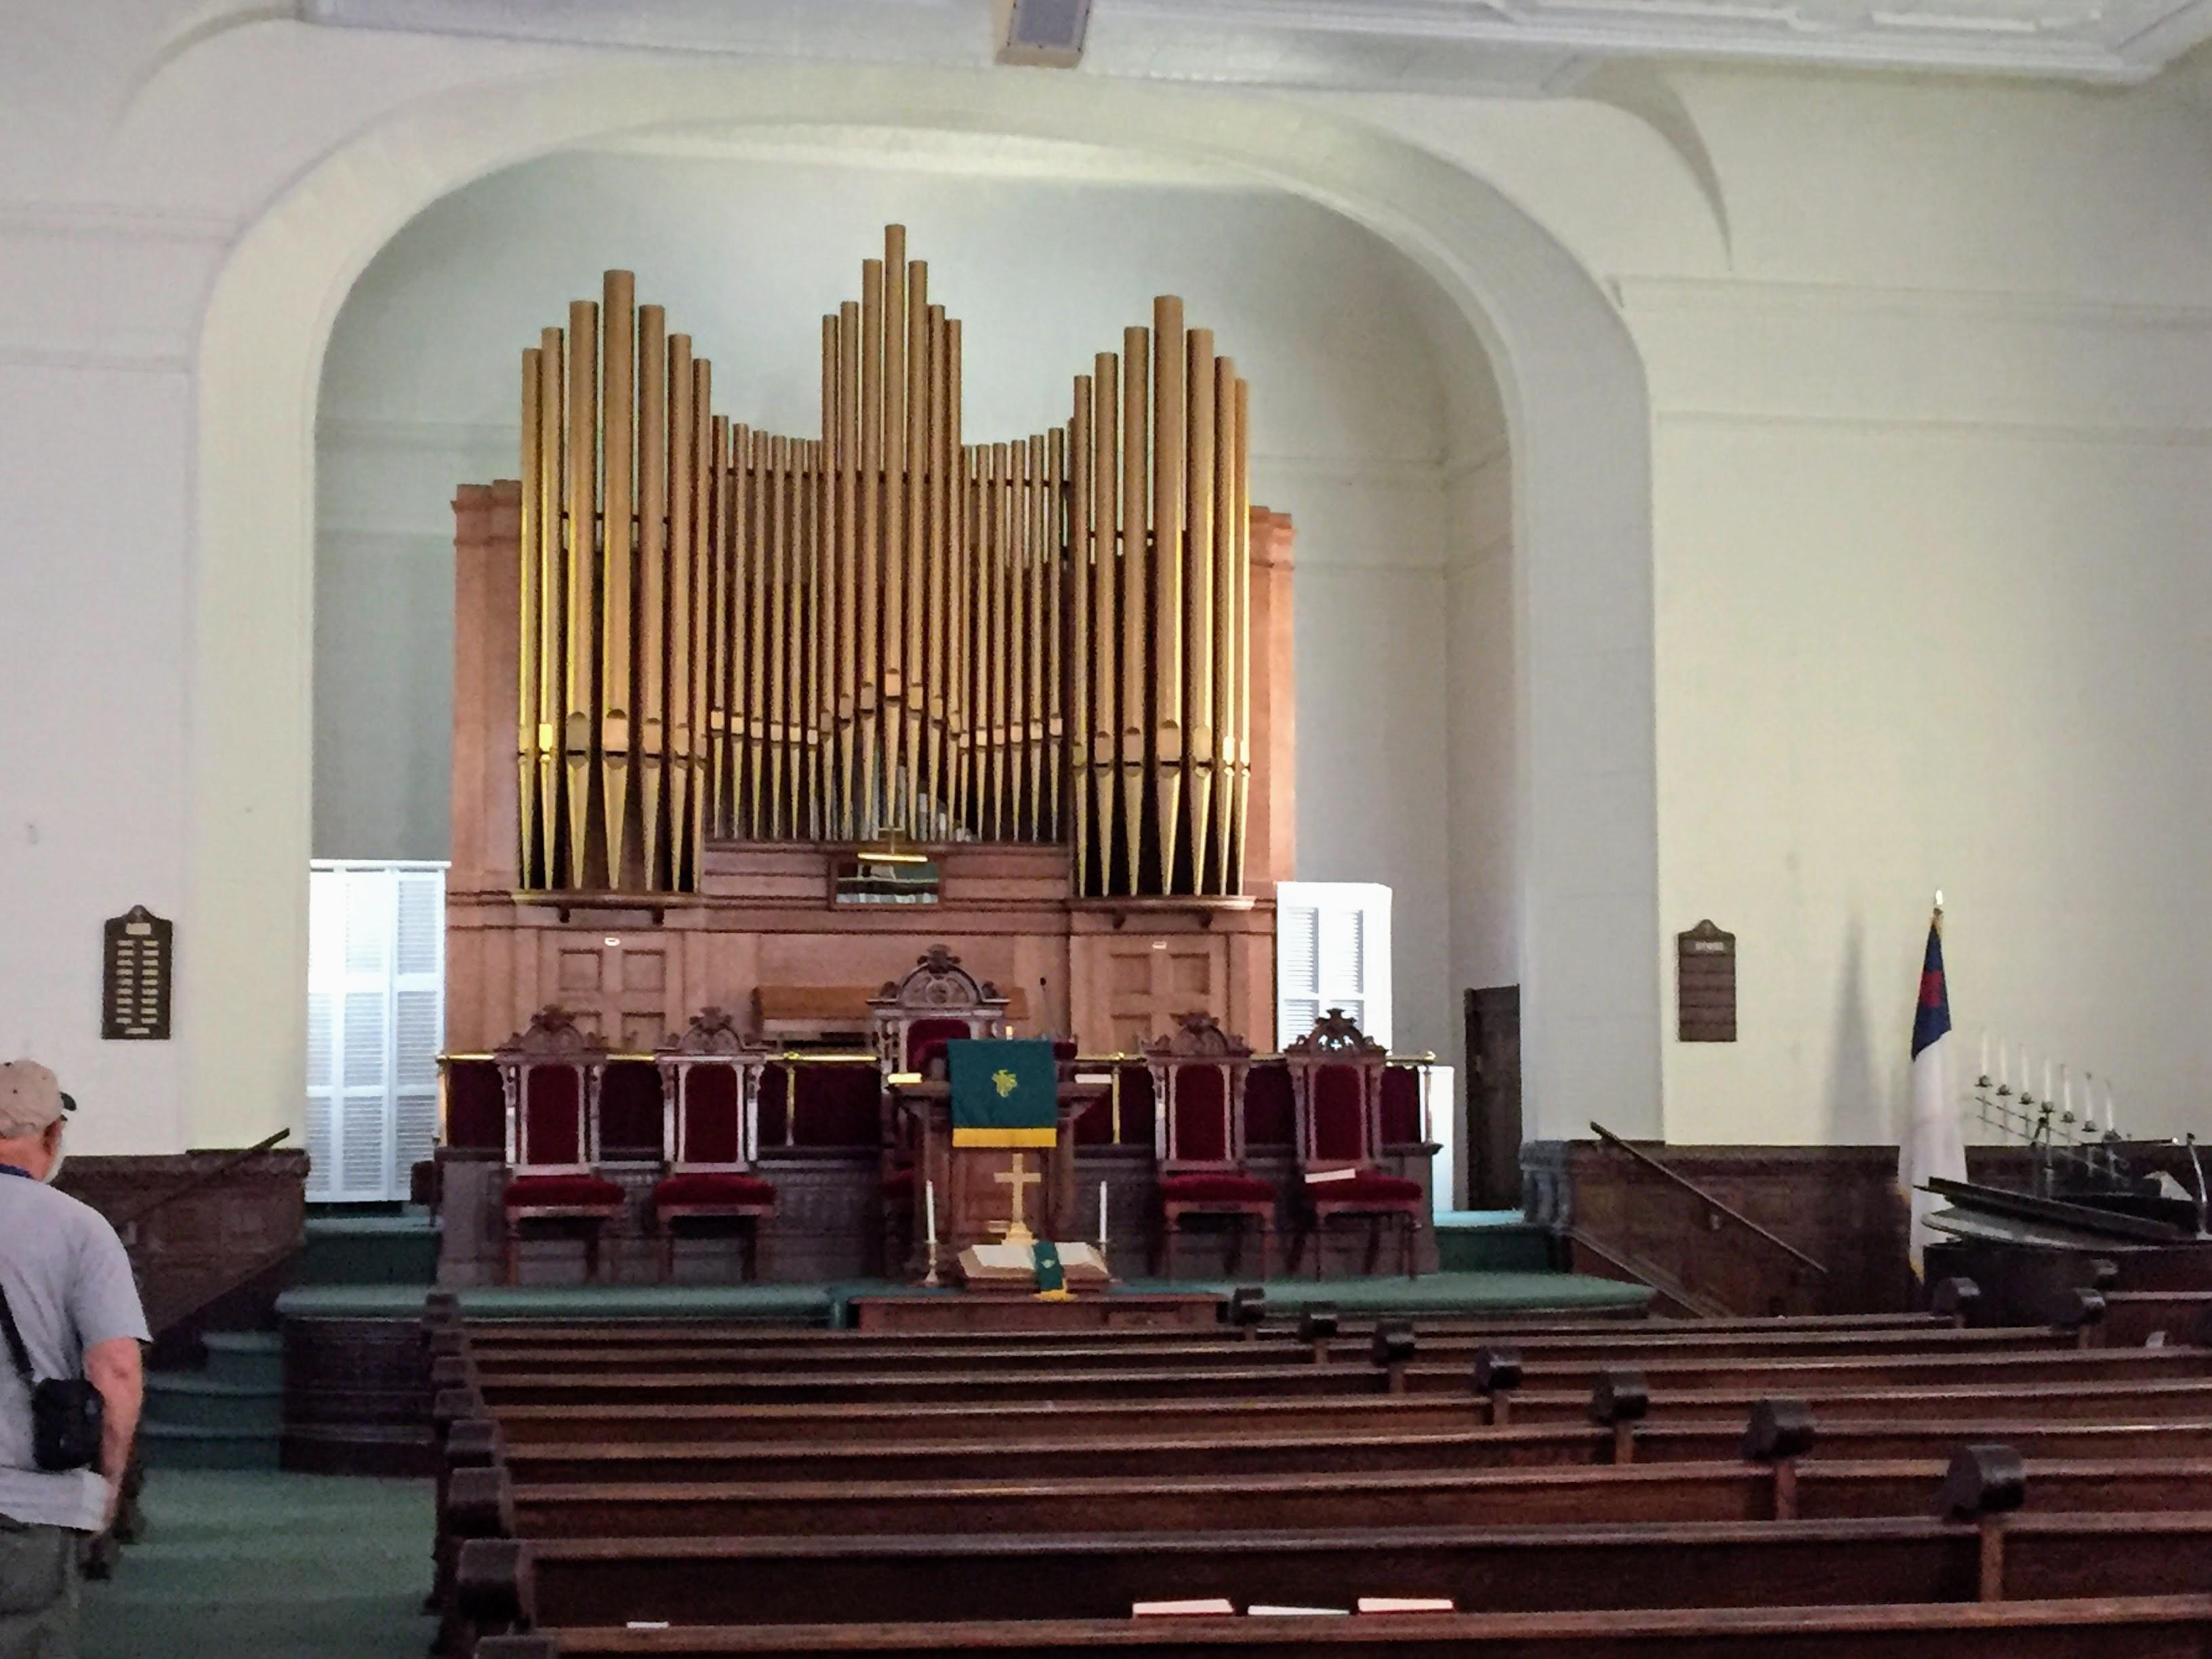 2017-07-21 Searsport Congregational Church 01